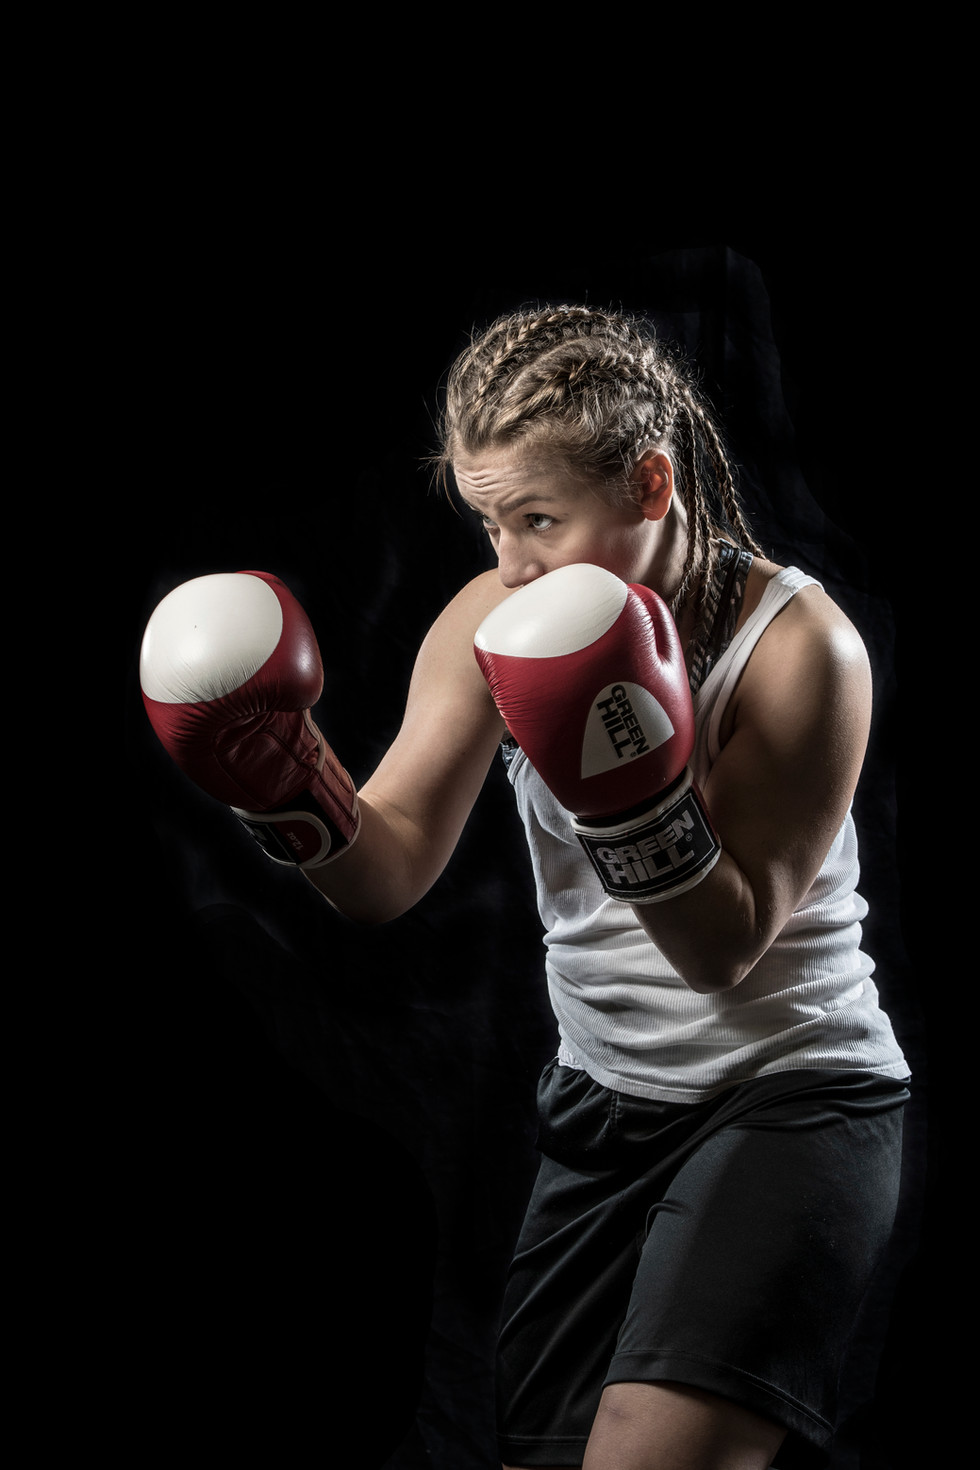 Sportfotografie-Boxen-Boxerin-14.jpg